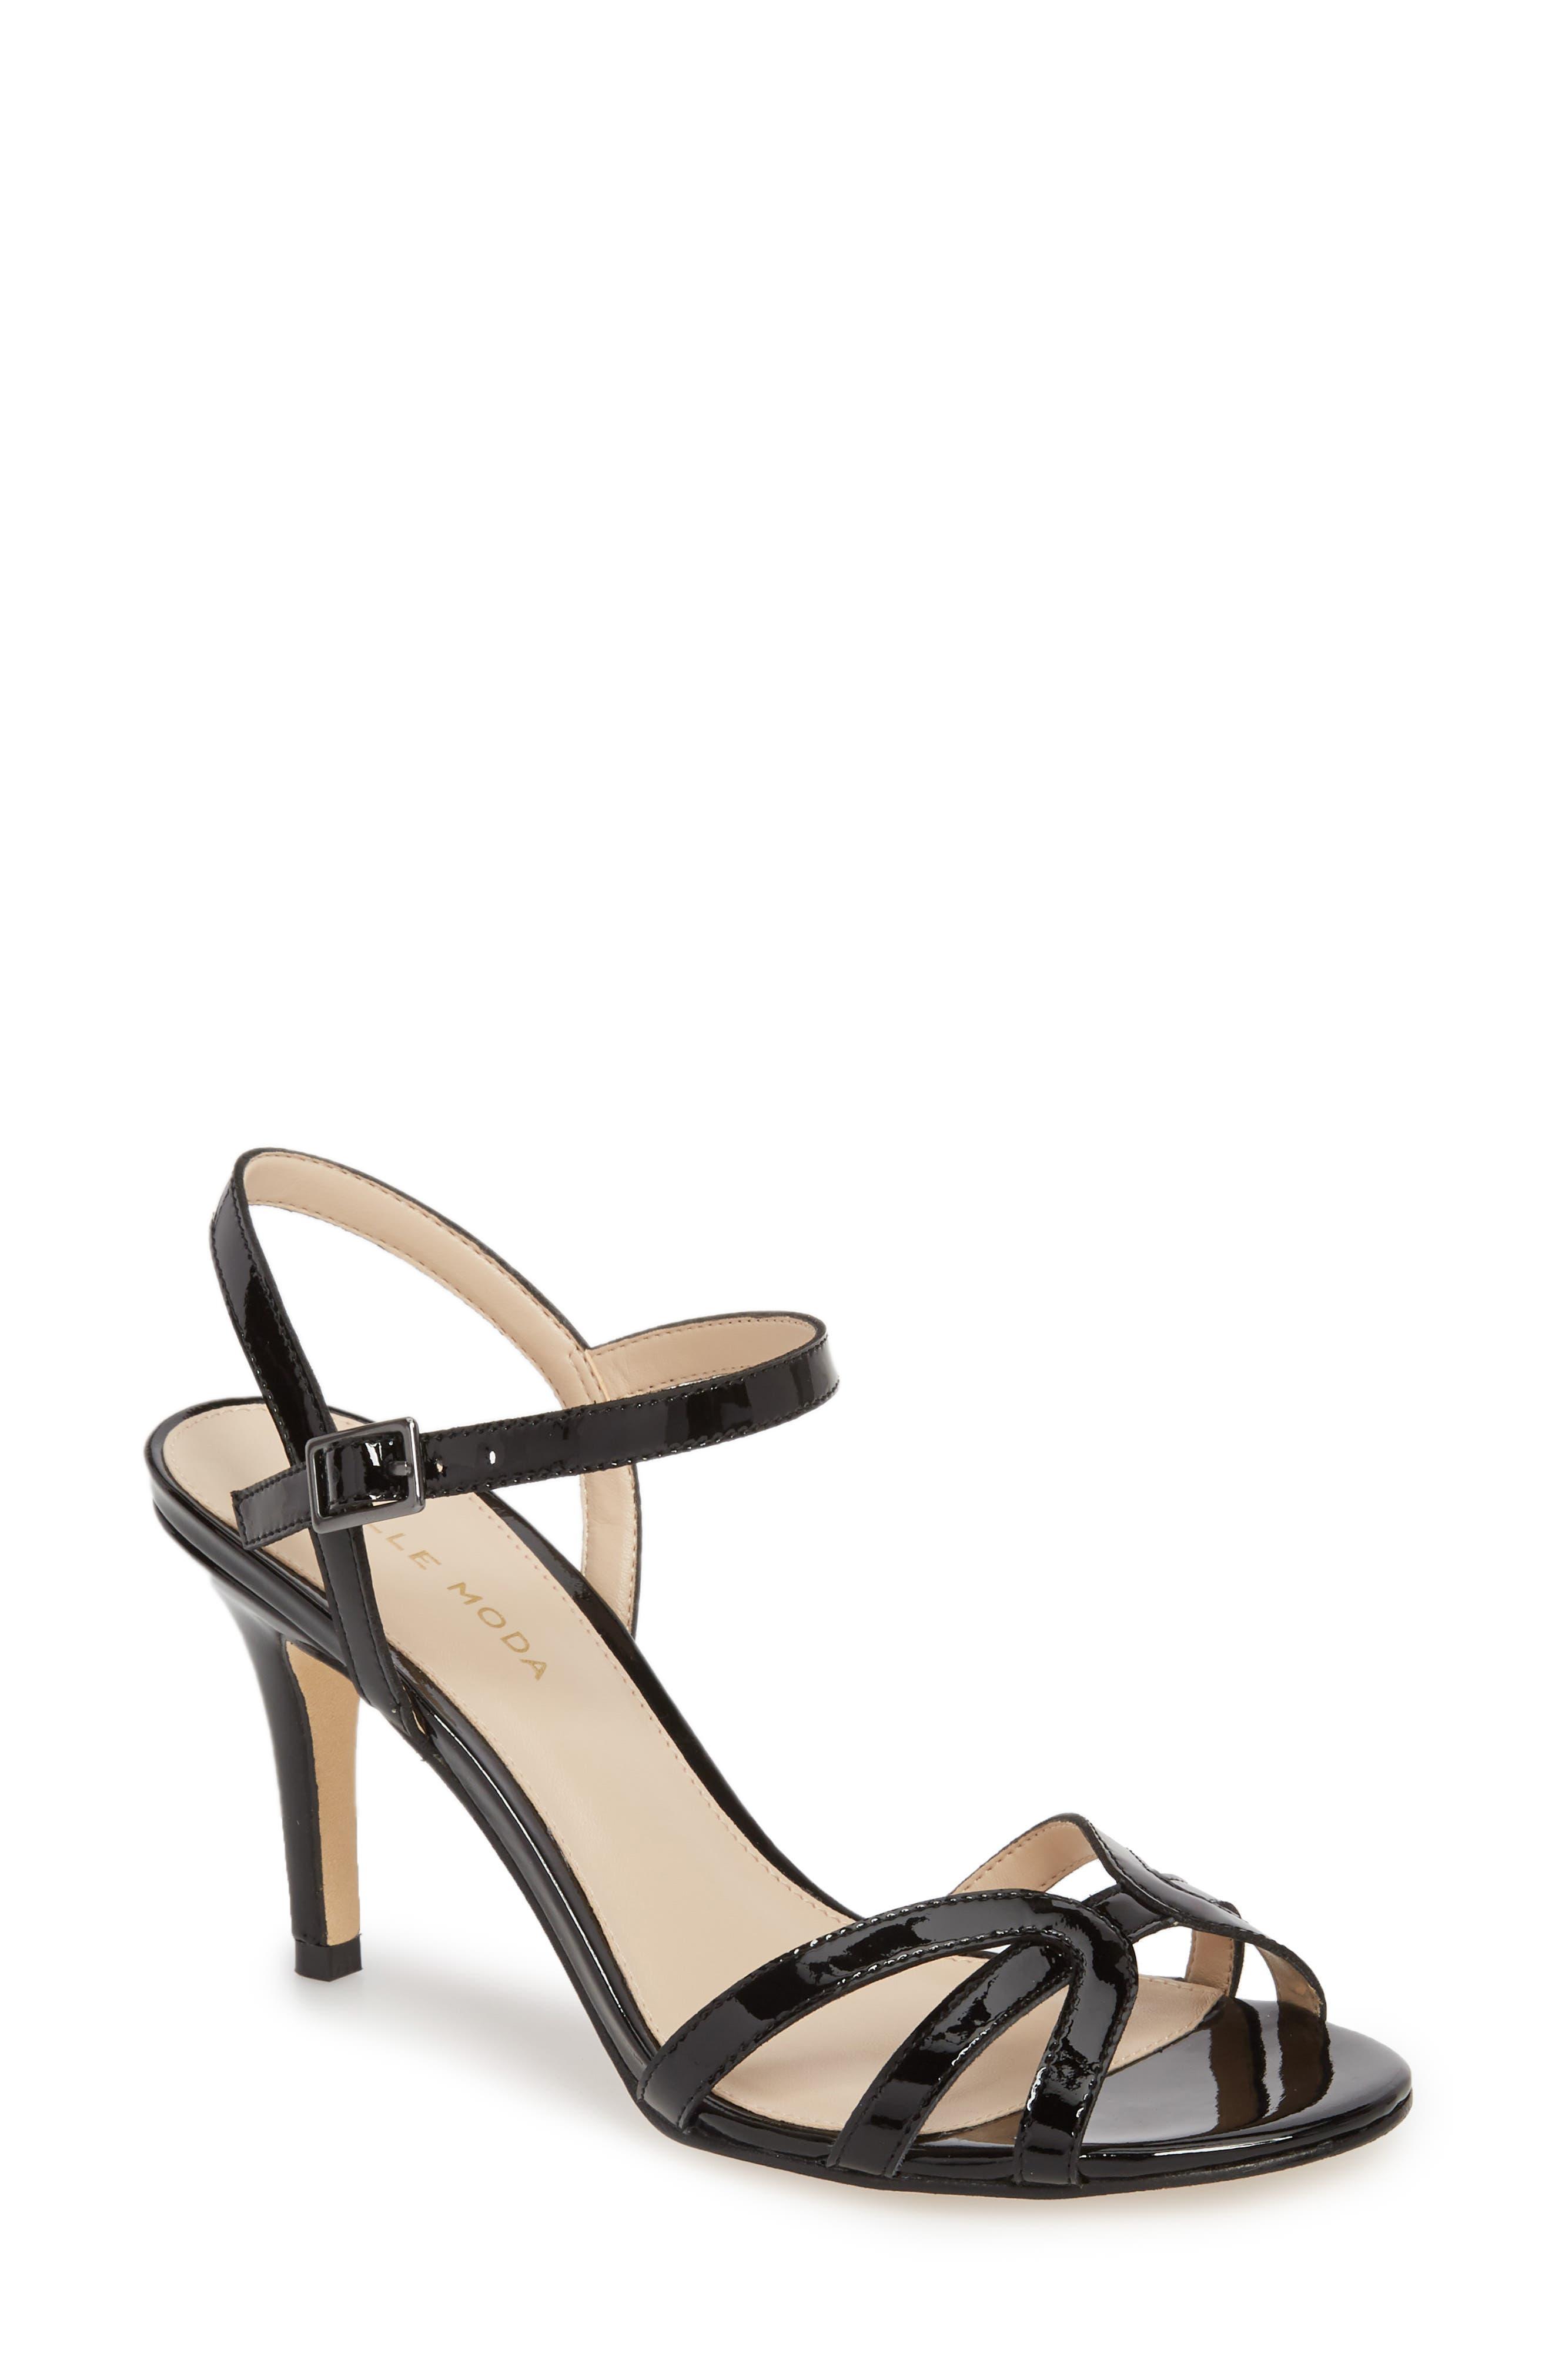 Roslyn3 Sandal,                         Main,                         color, BLACK PATENT LEATHER